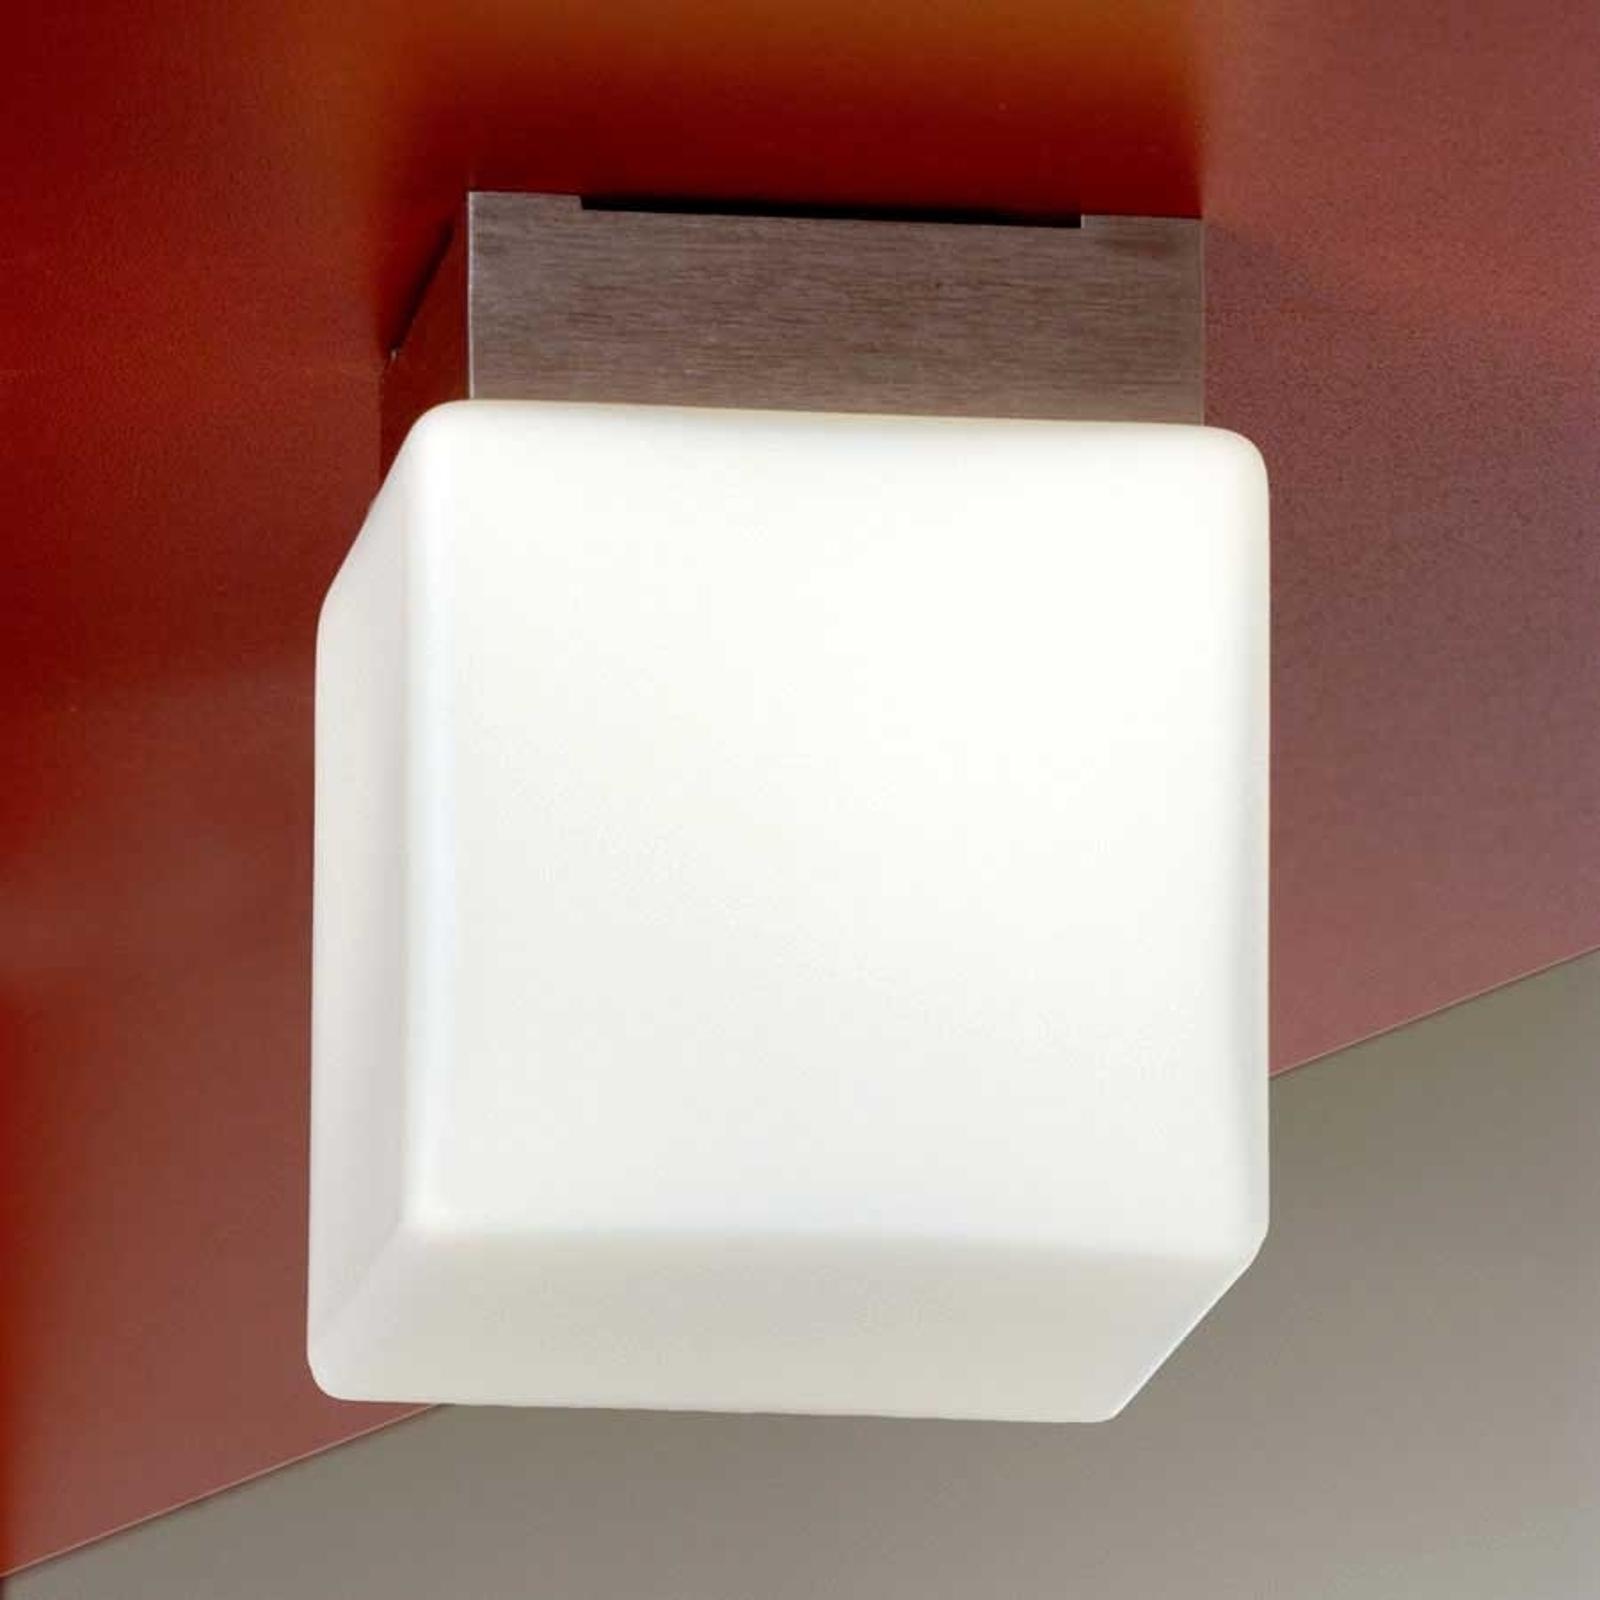 Ceiling light CUBE_2000259_1